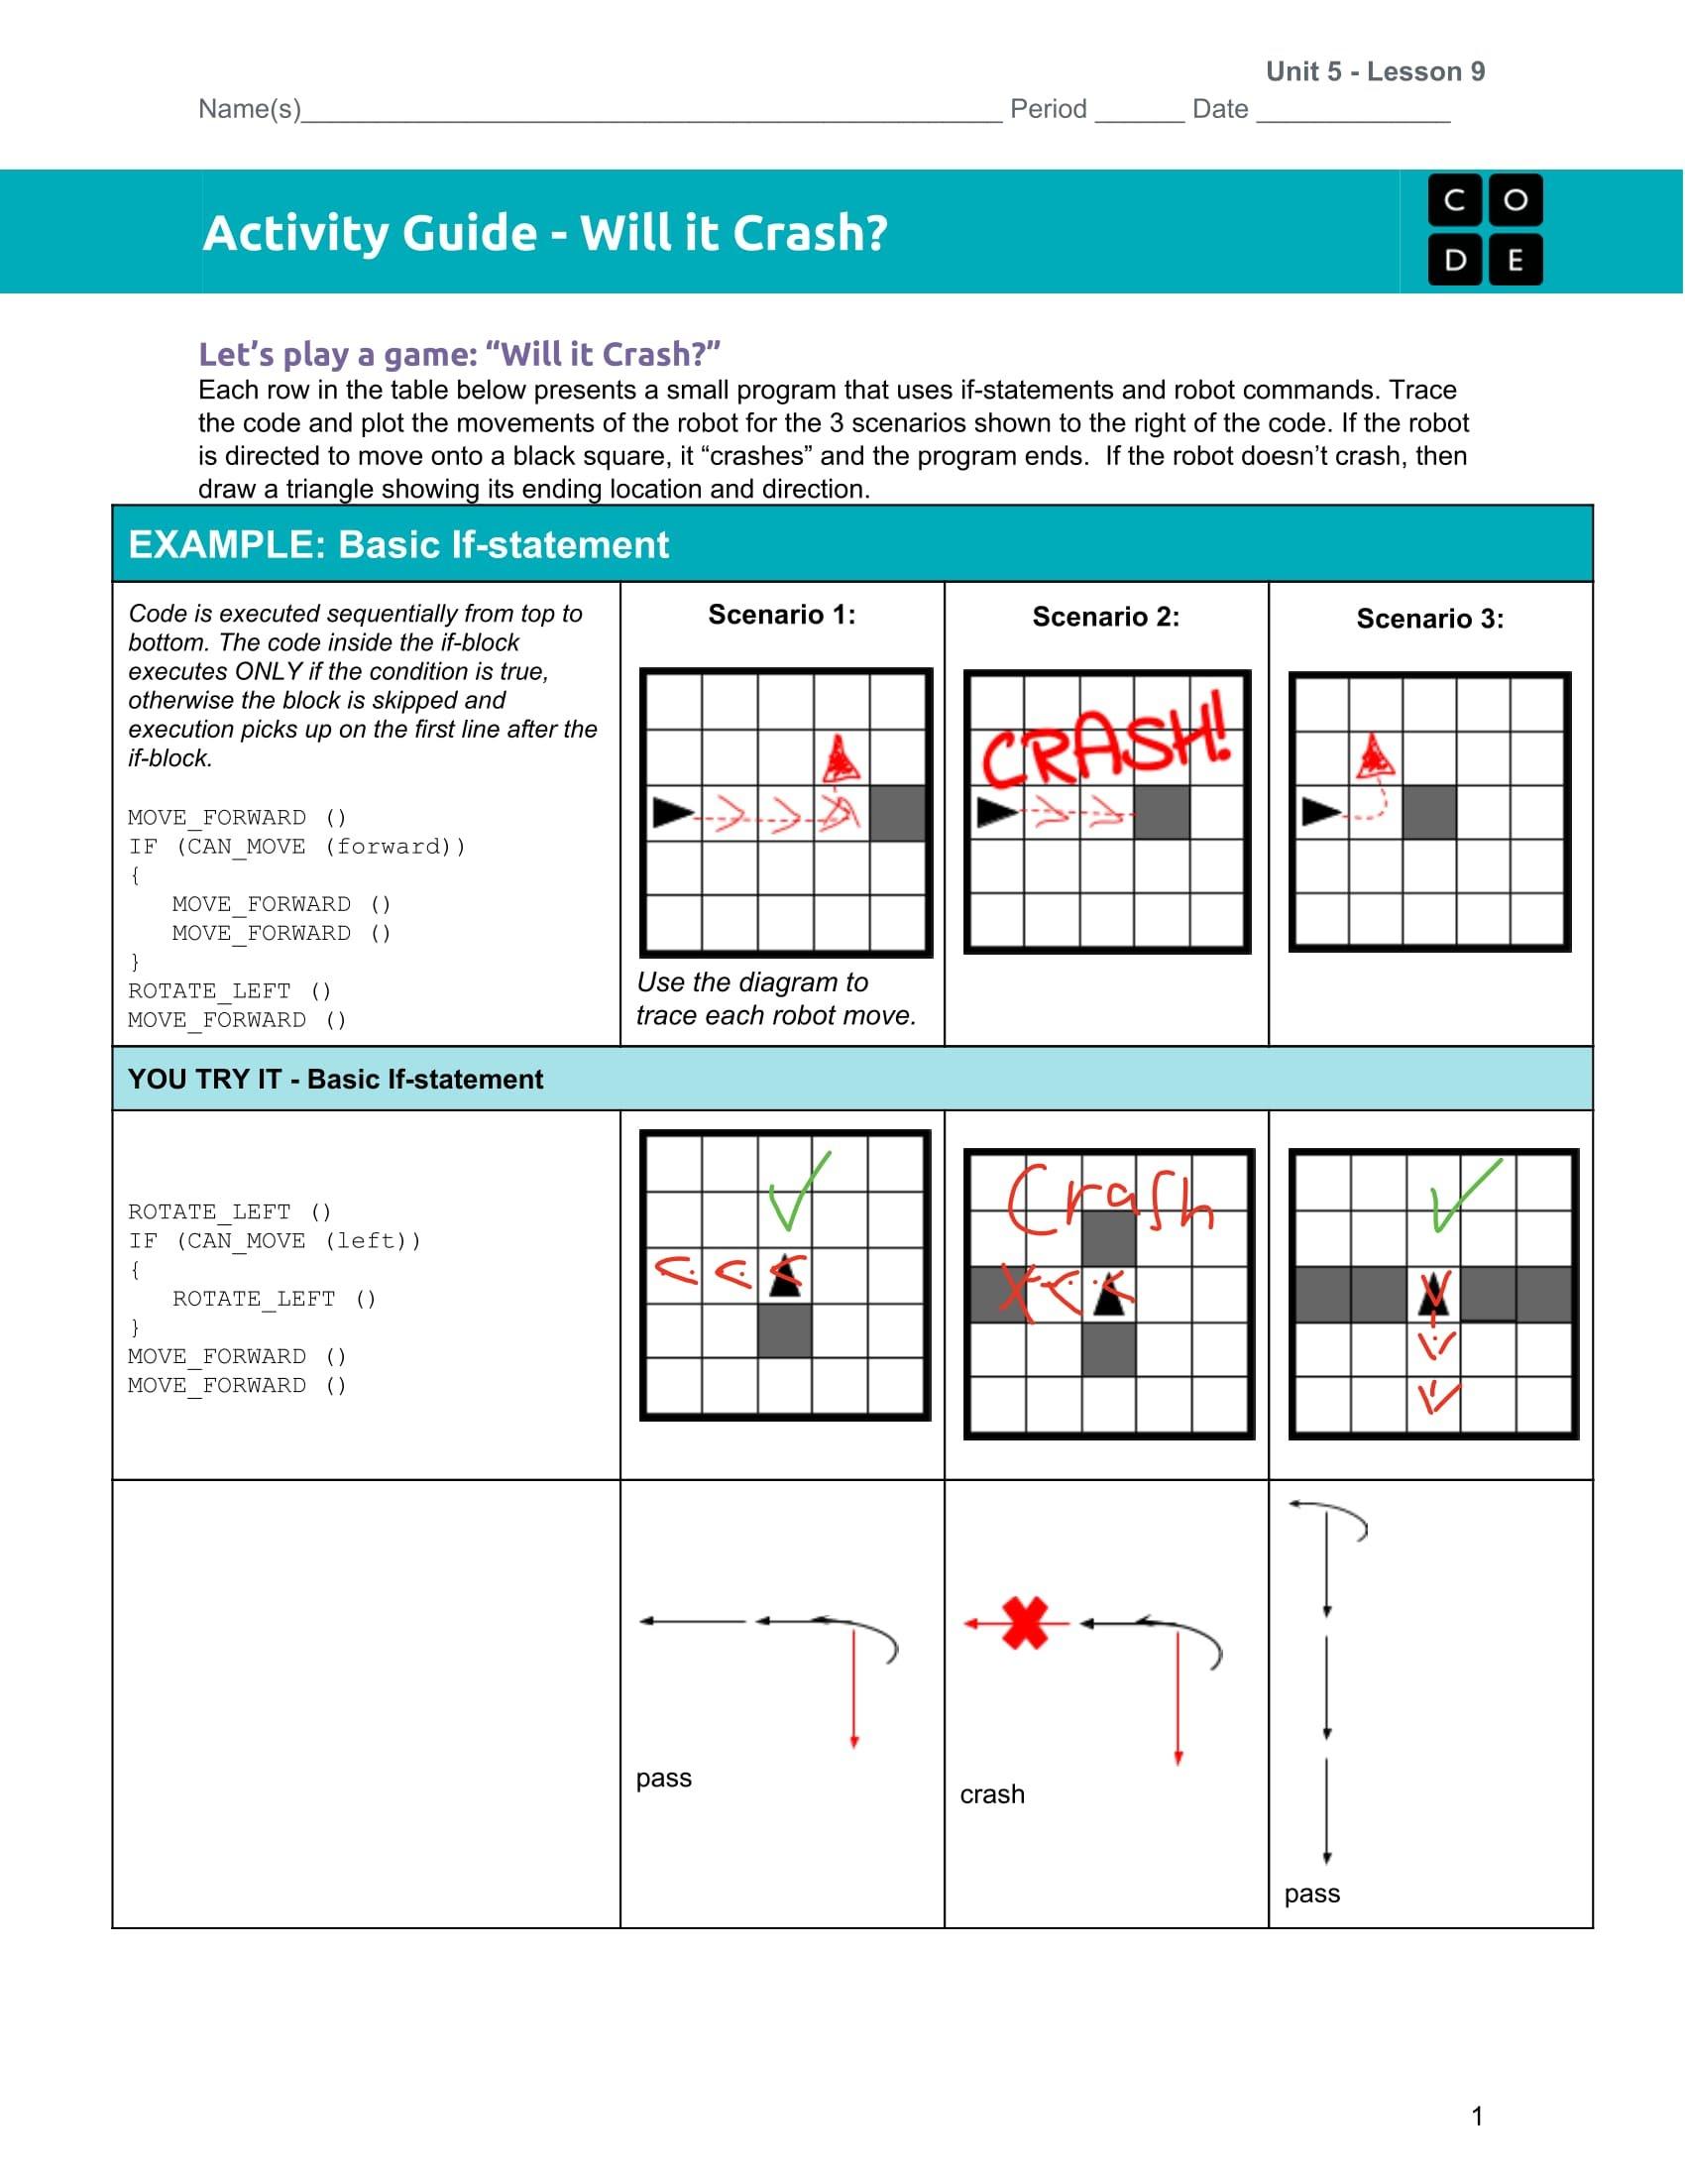 Home Netwerks 1 5 Manual Guide